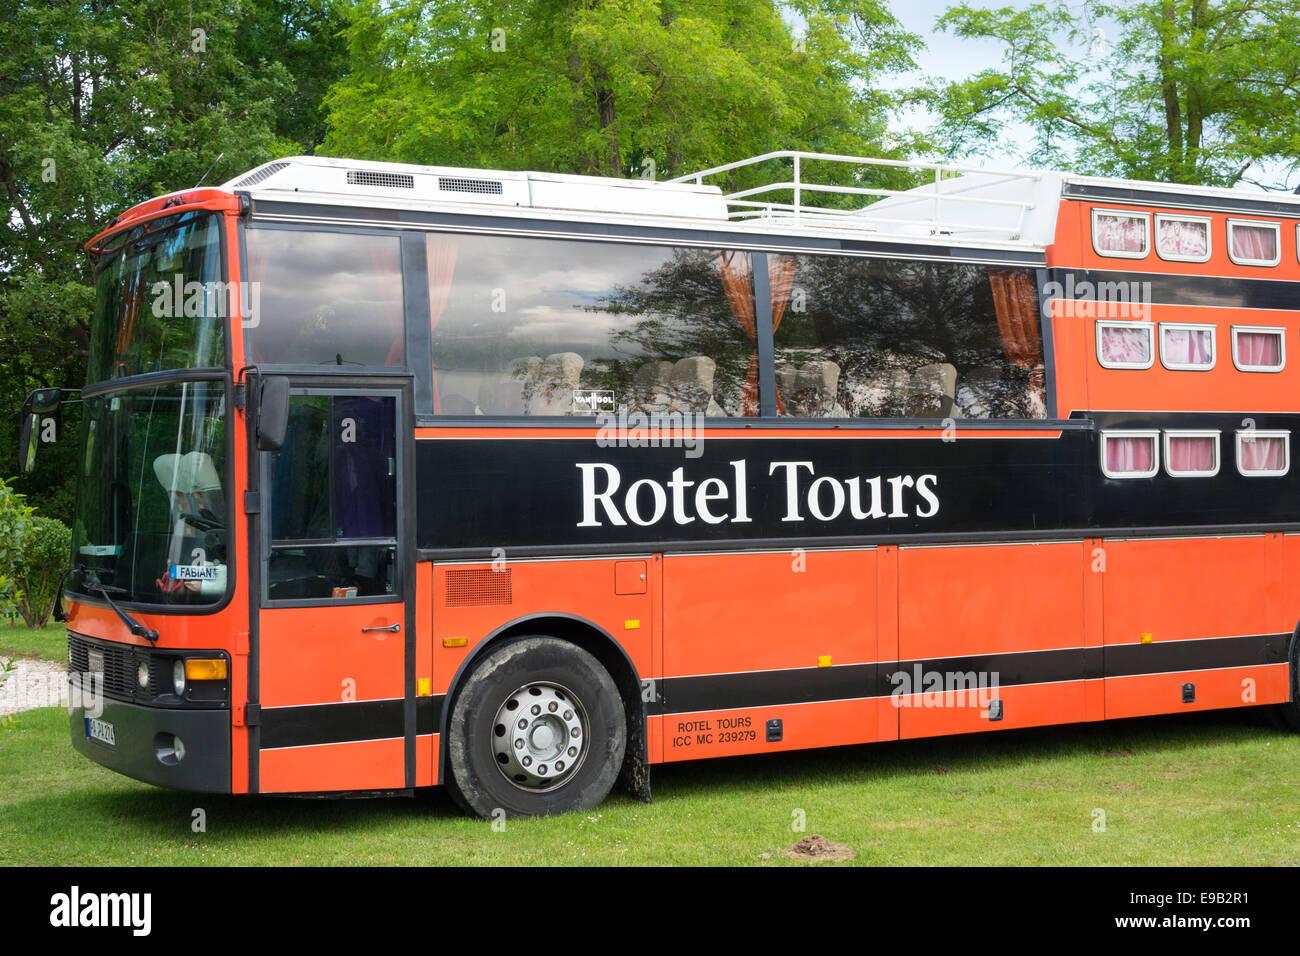 Rotel tours kabine